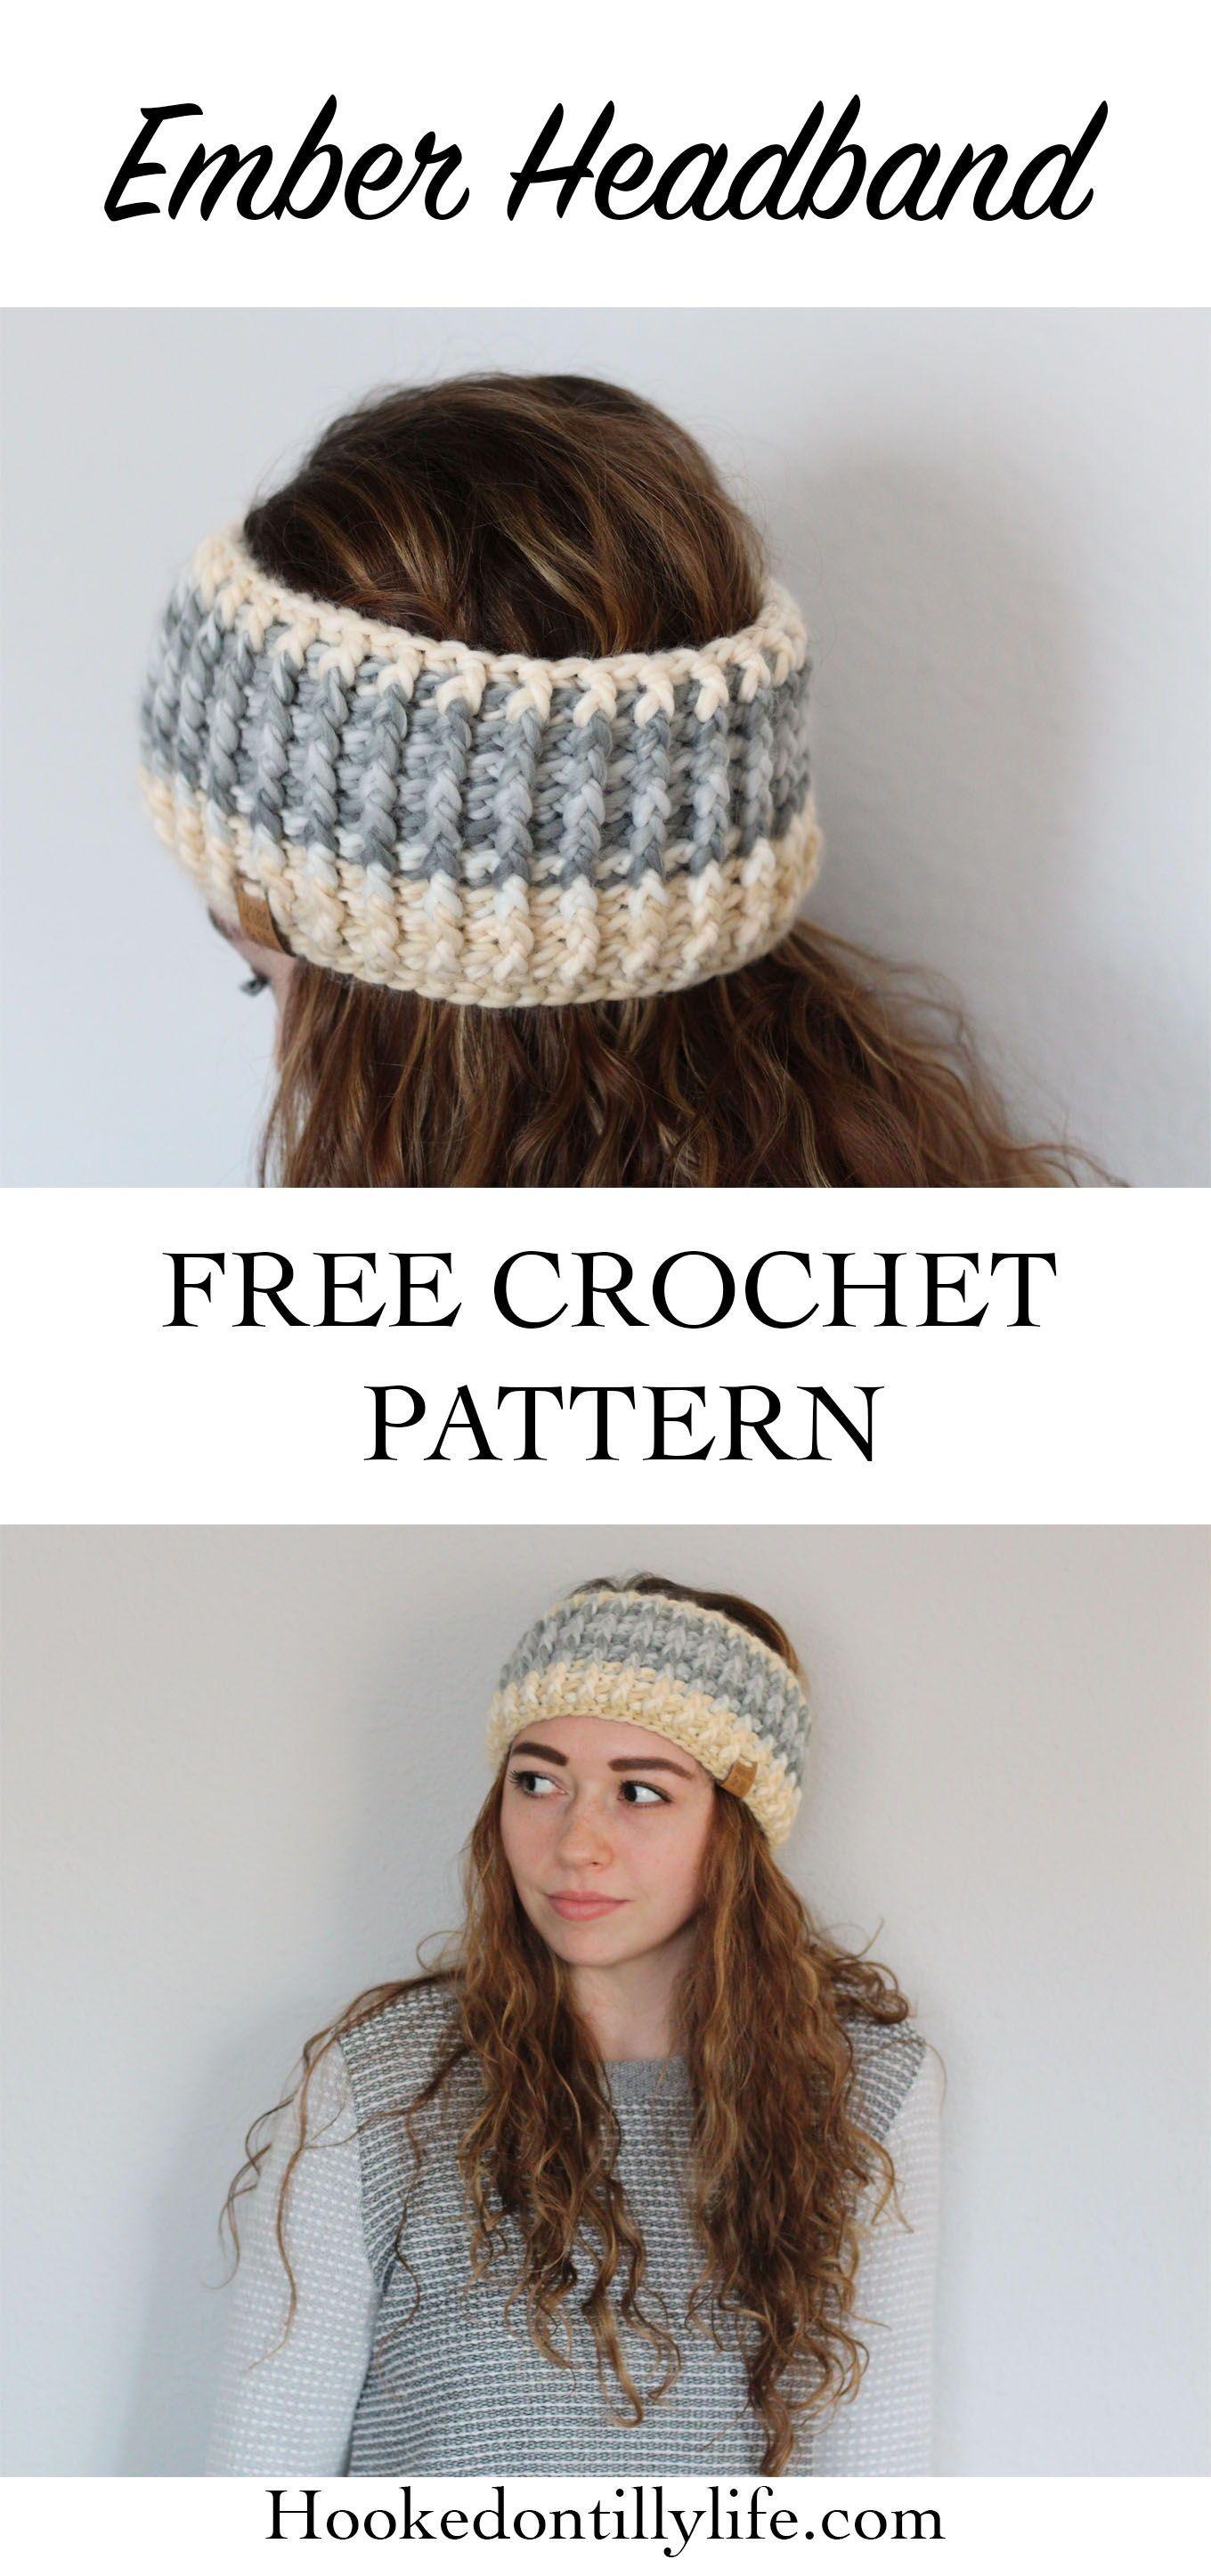 Ember Headband - Free Crochet Pattern #crochetheadbandpattern